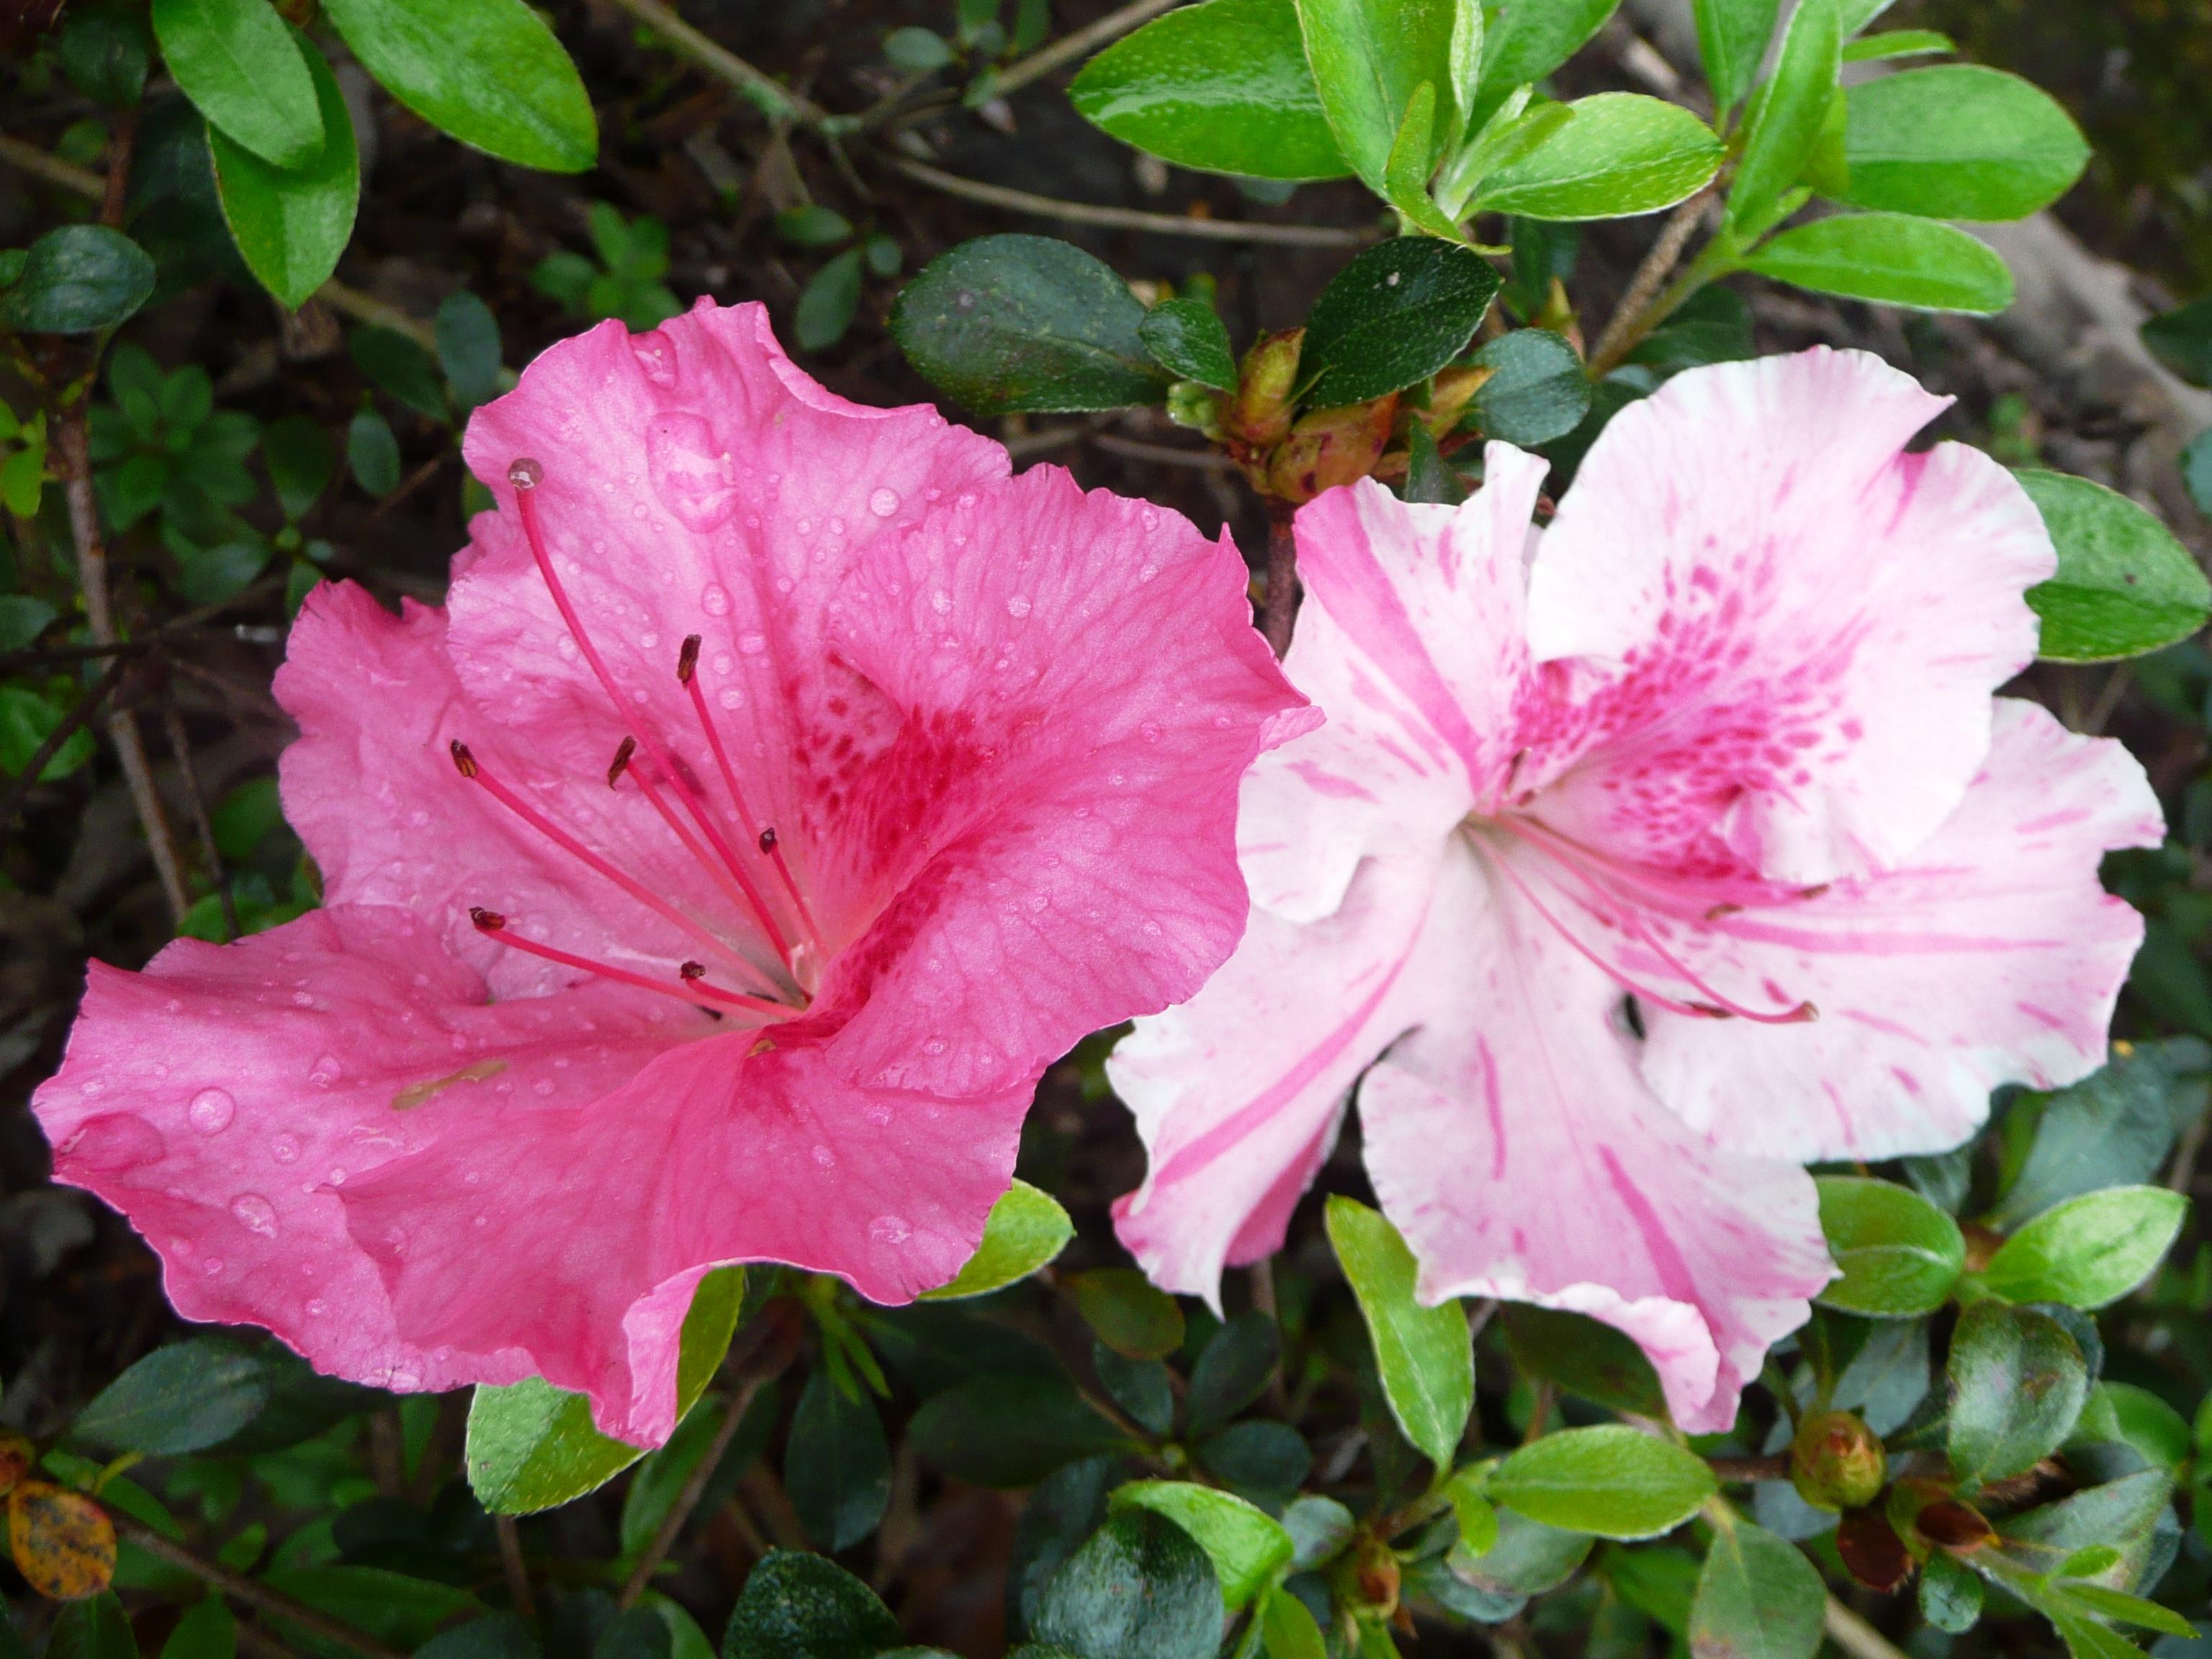 Robin hill azaleas include new louisiana super plant lsu for The azalea